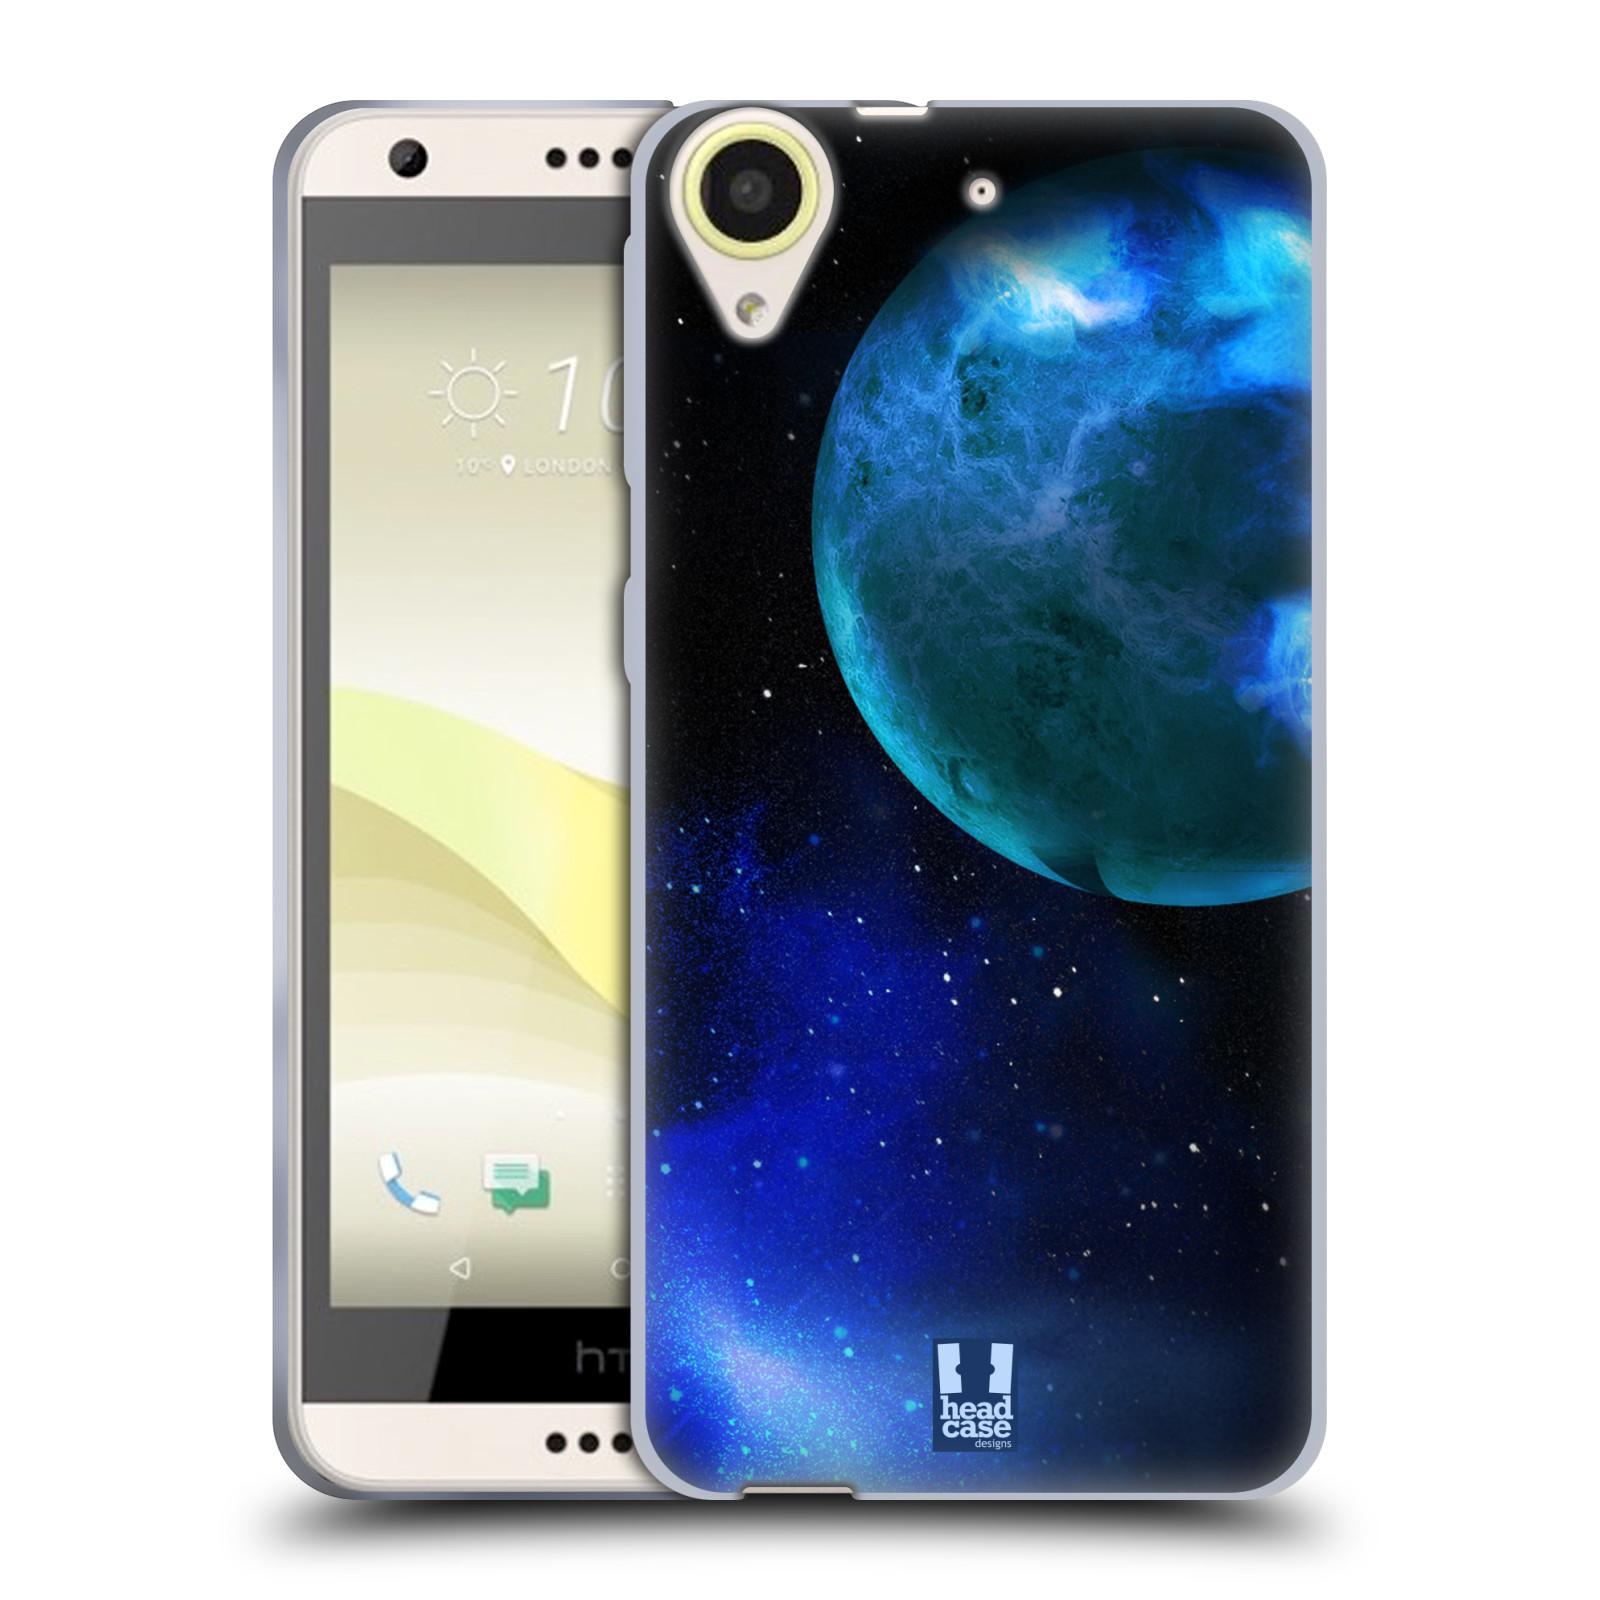 Silikonové pouzdro na mobil HTC Desire 650 HEAD CASE VENUŠE (Silikonový kryt či obal na mobilní telefon HTC Desire 650)